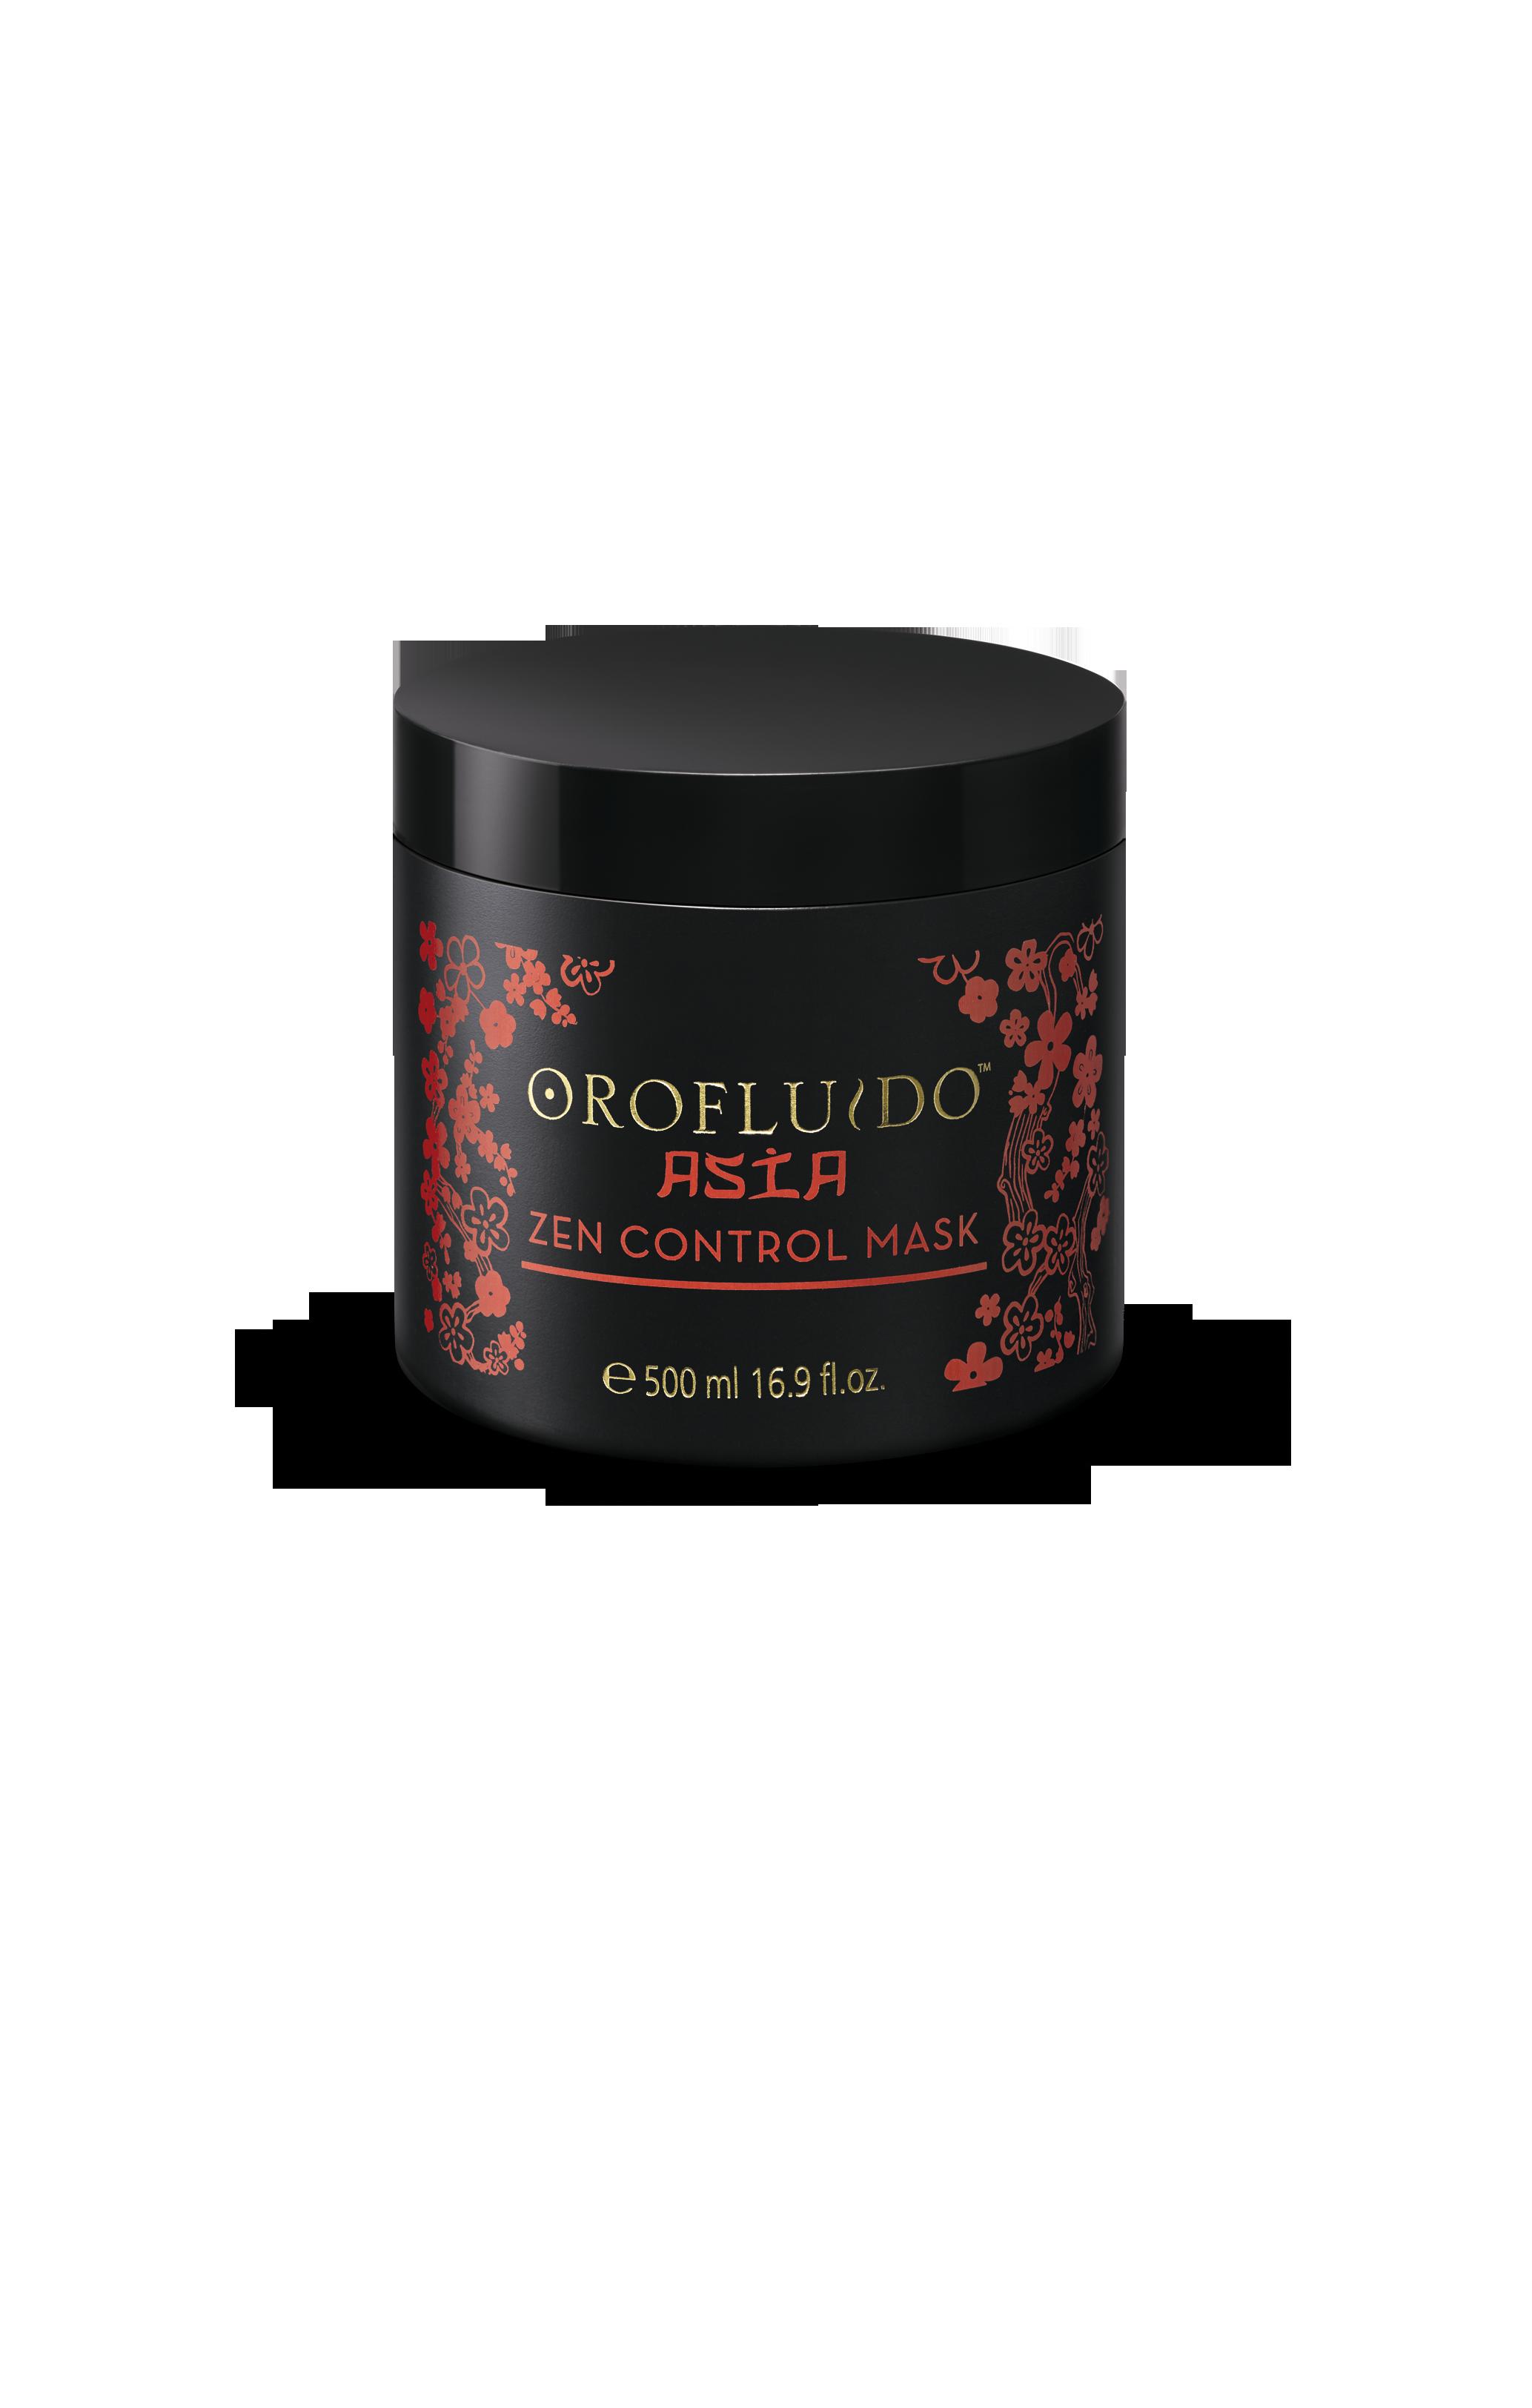 OROFLUIDO Маска для волос / Orofluido mask ASIA 500мл